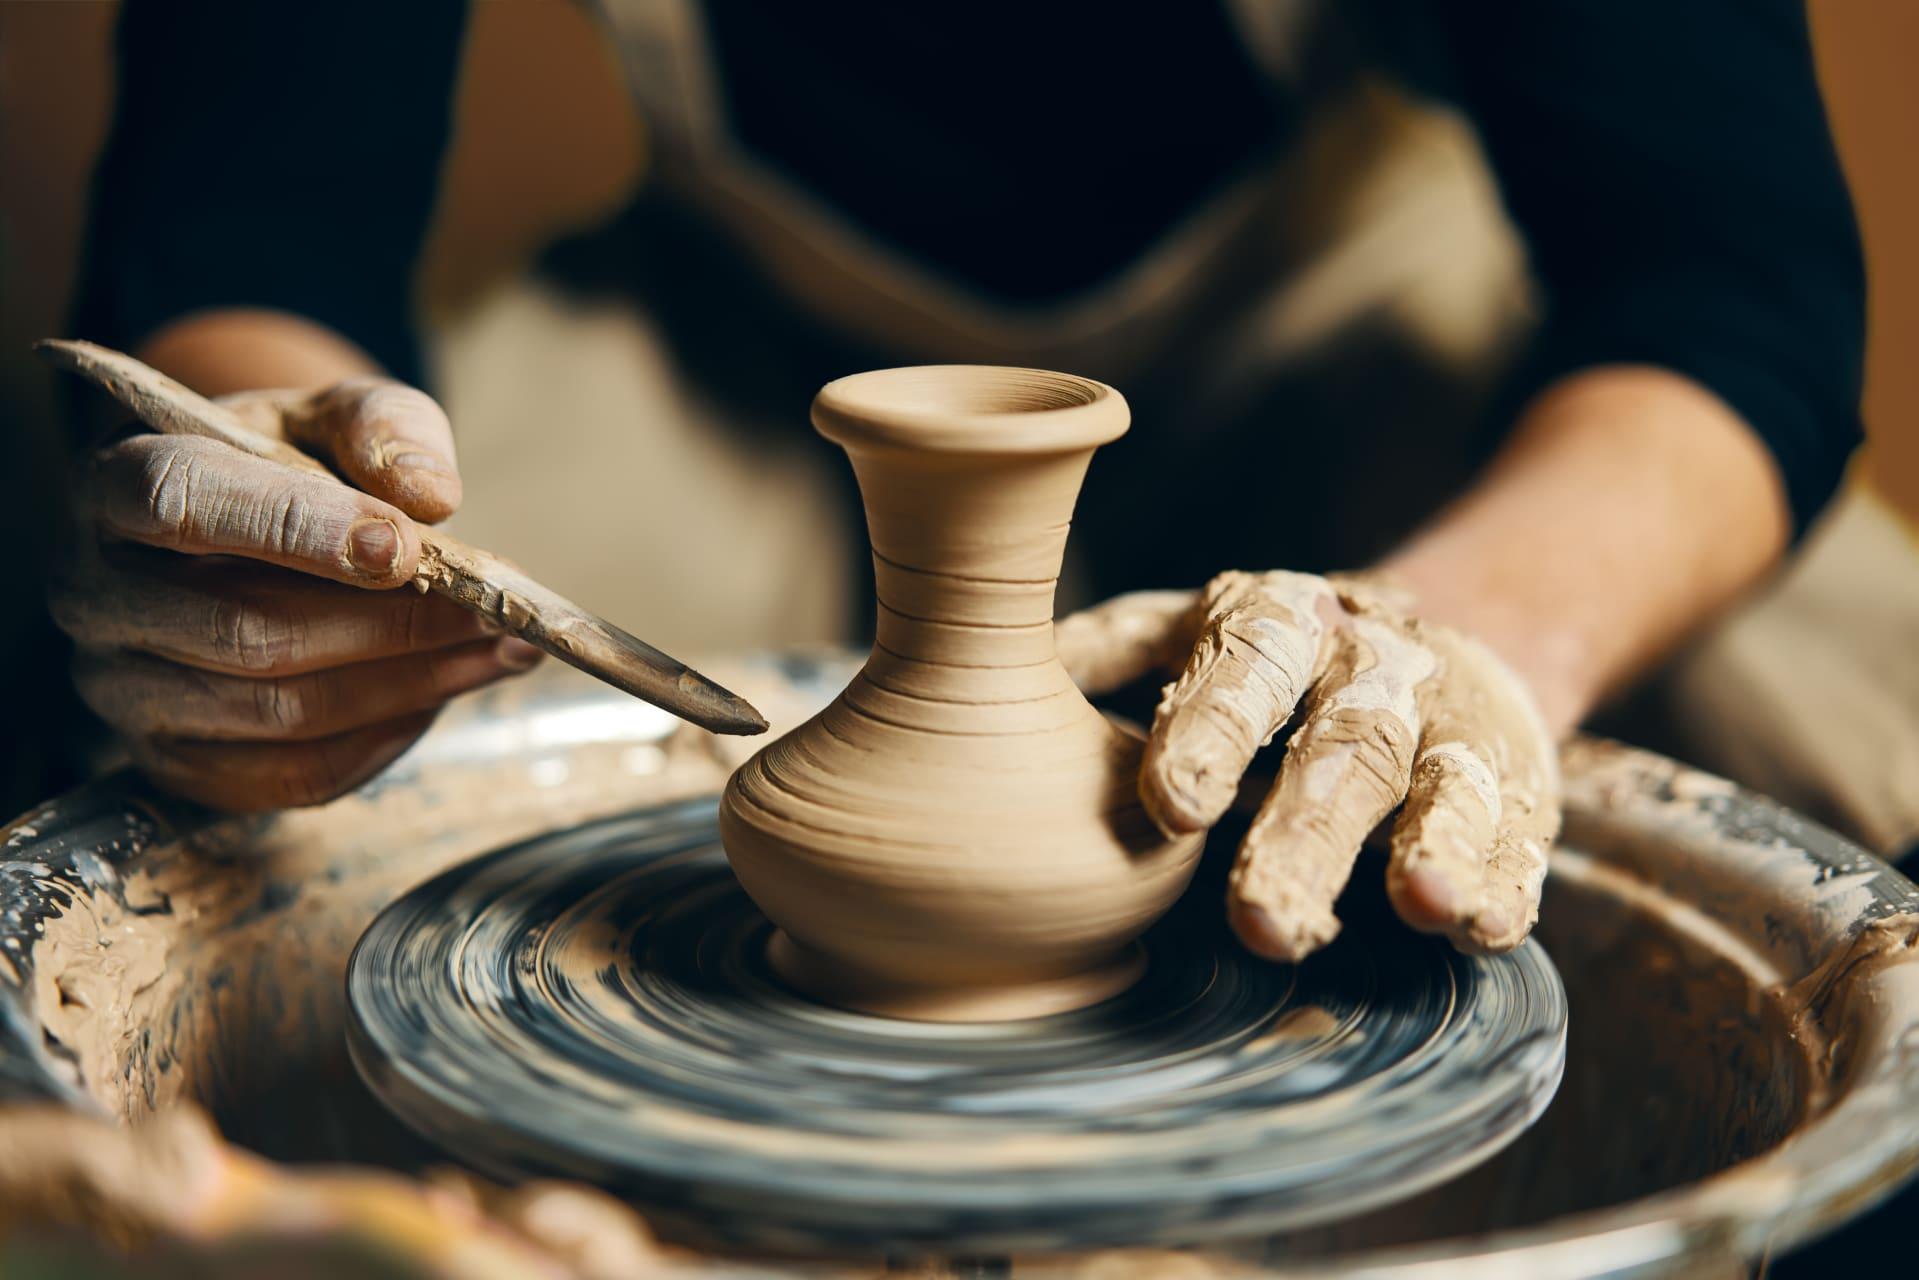 La Paz - Ceramic artist: Mario Sarabia